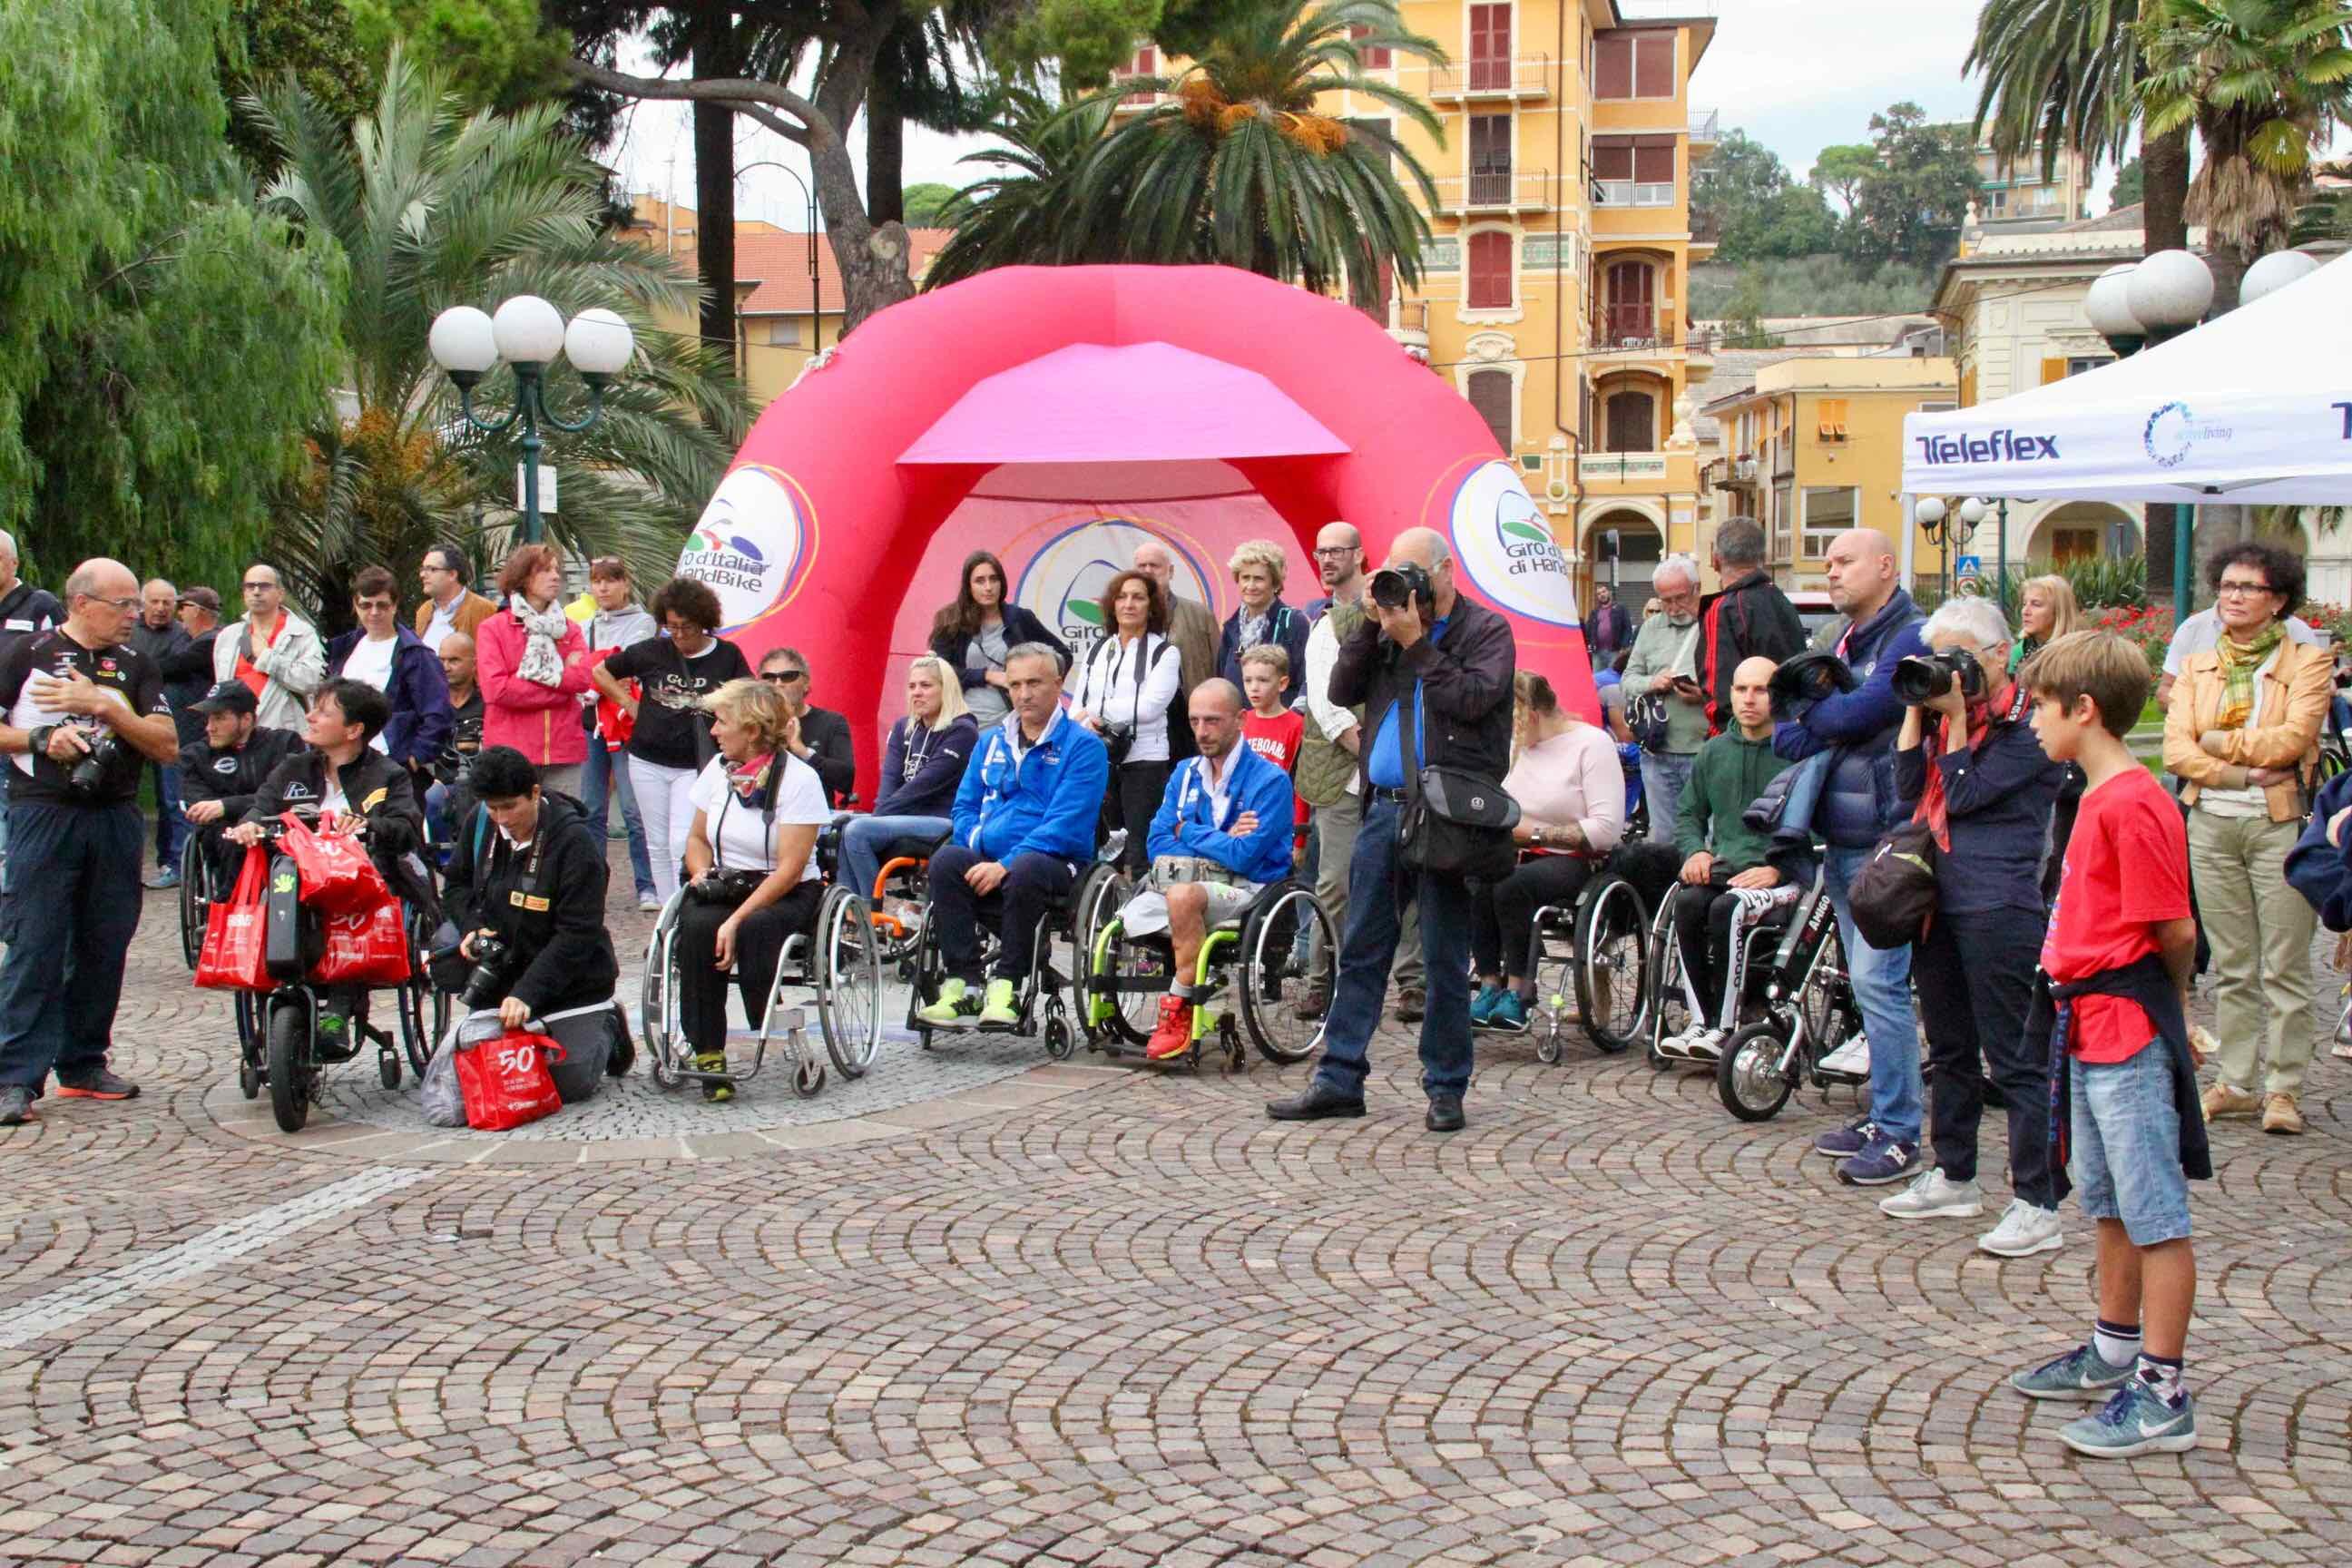 1° Memorial don Nando Negri a Chiavari per il Giro d'Italia Handbike 2018 - 15